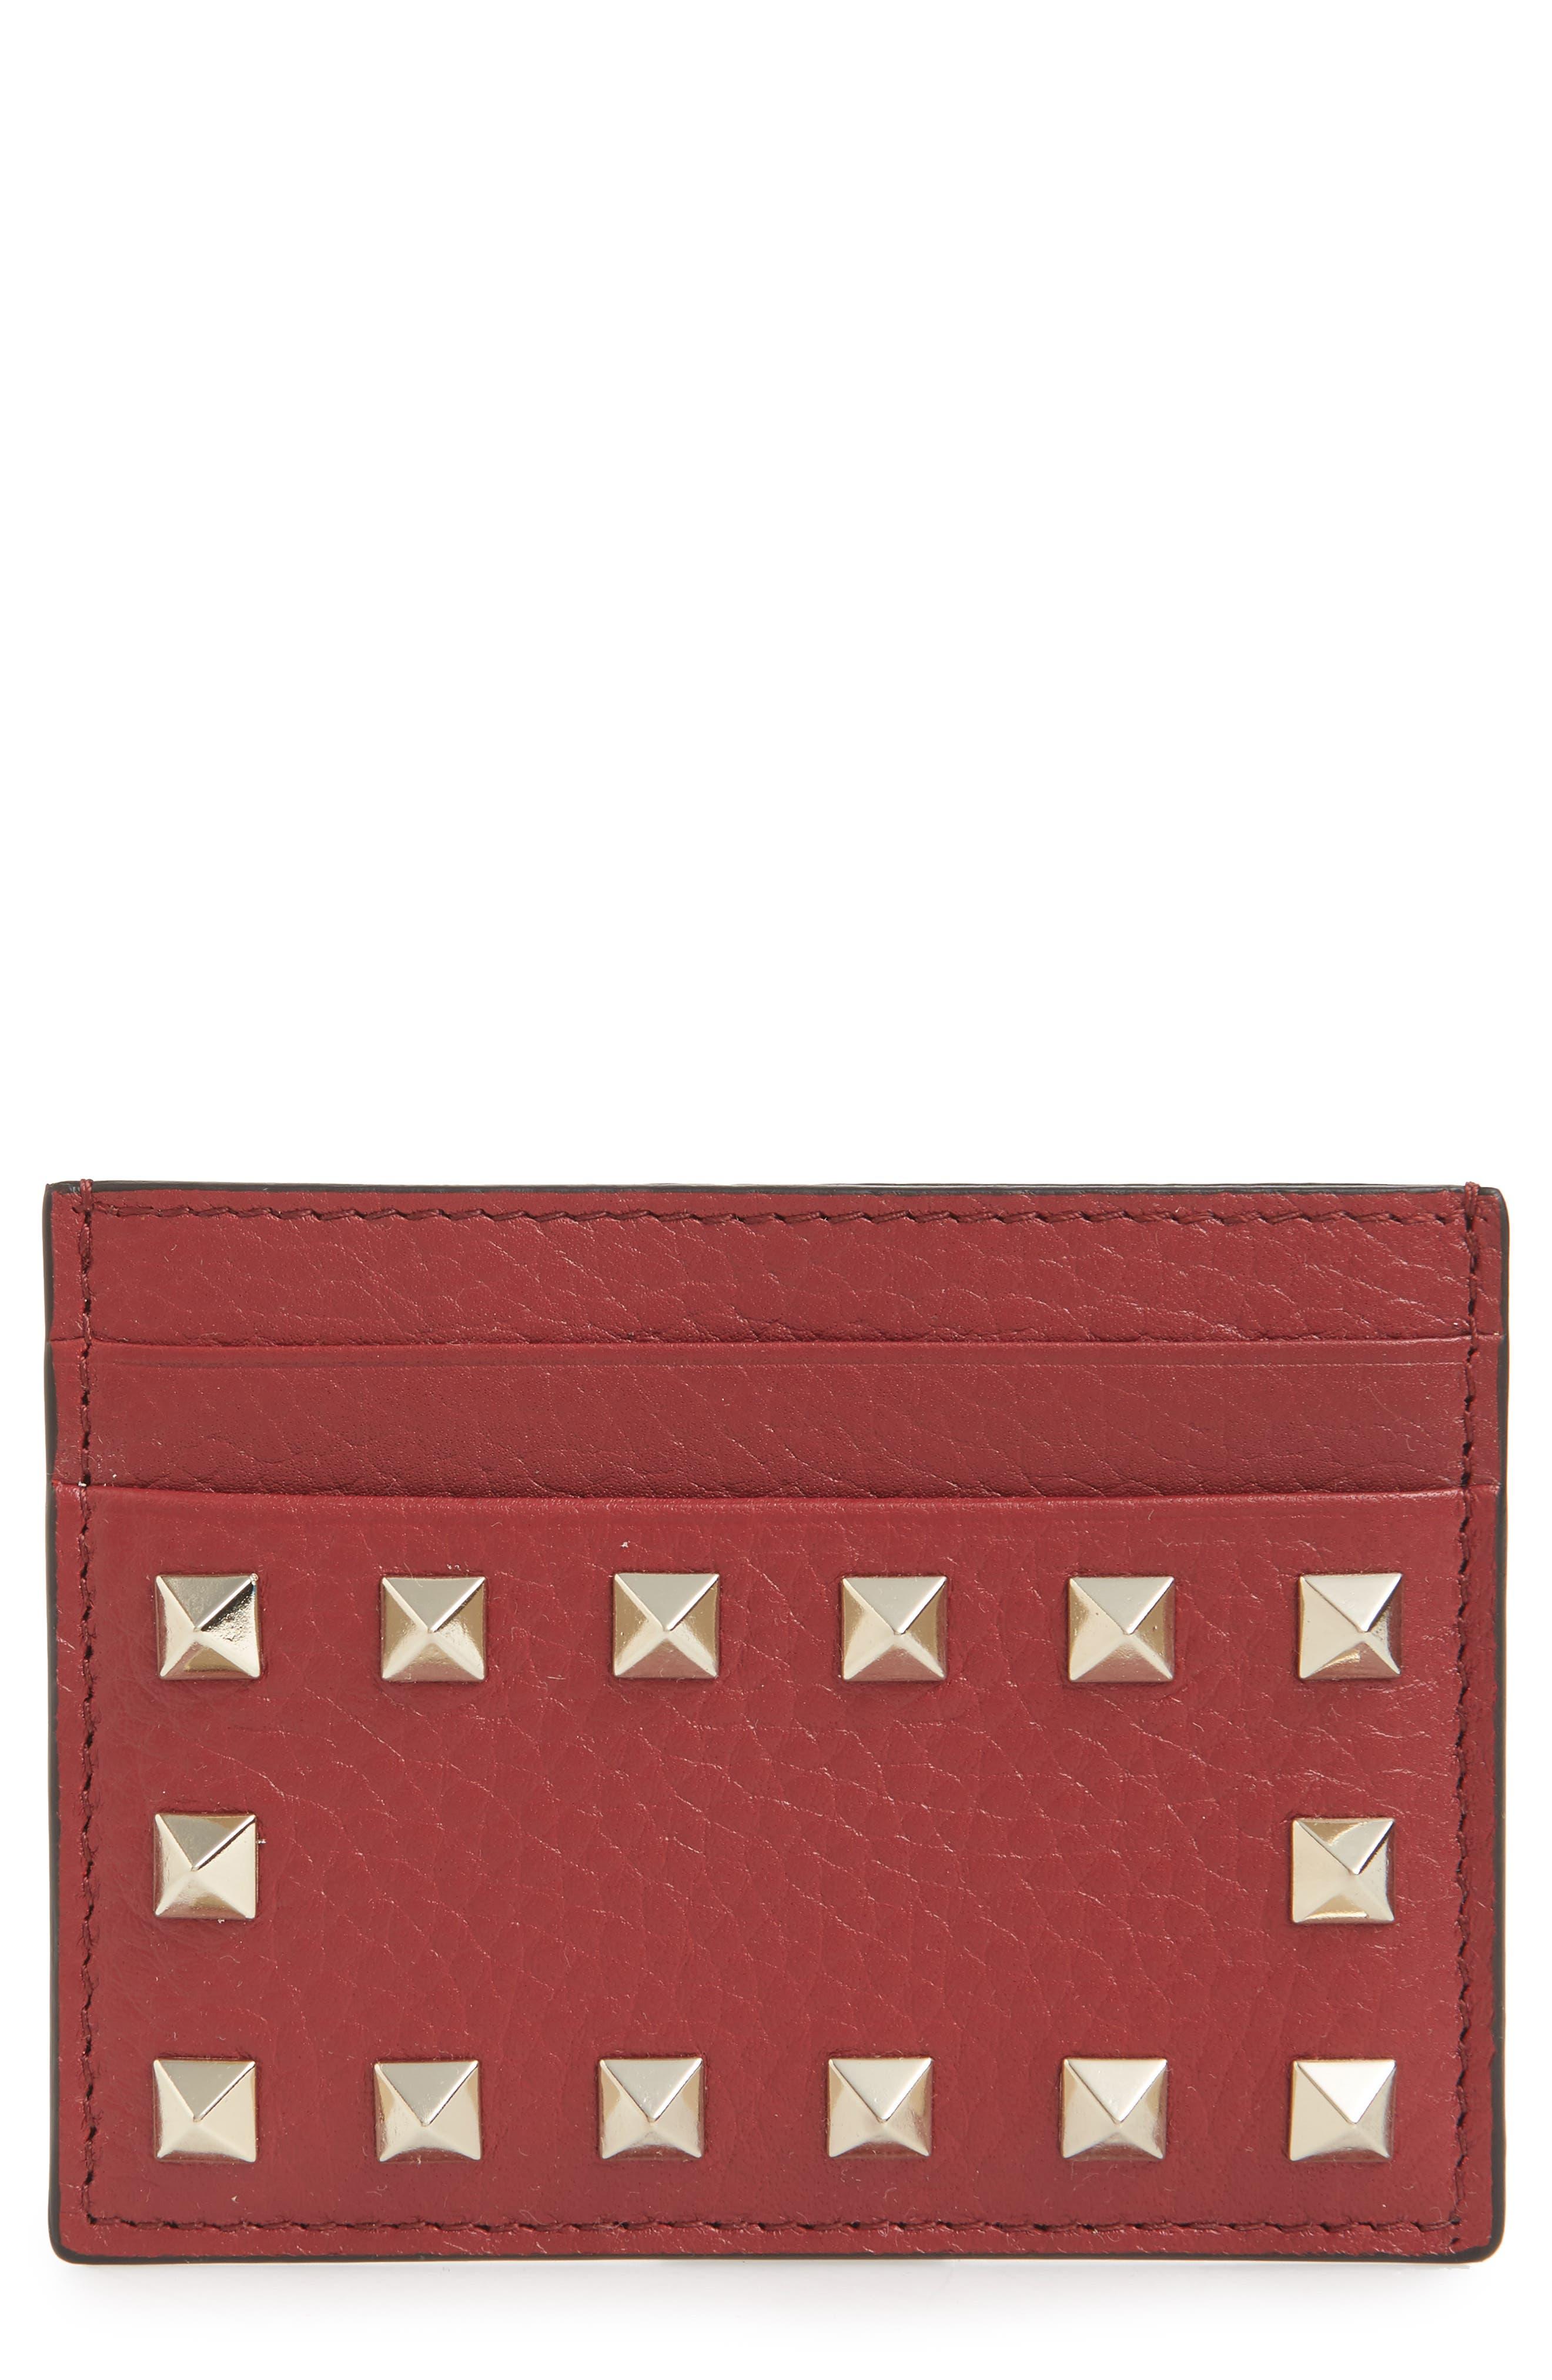 Rockstud Calfskin Leather Card Holder,                             Main thumbnail 1, color,                             RUBINO